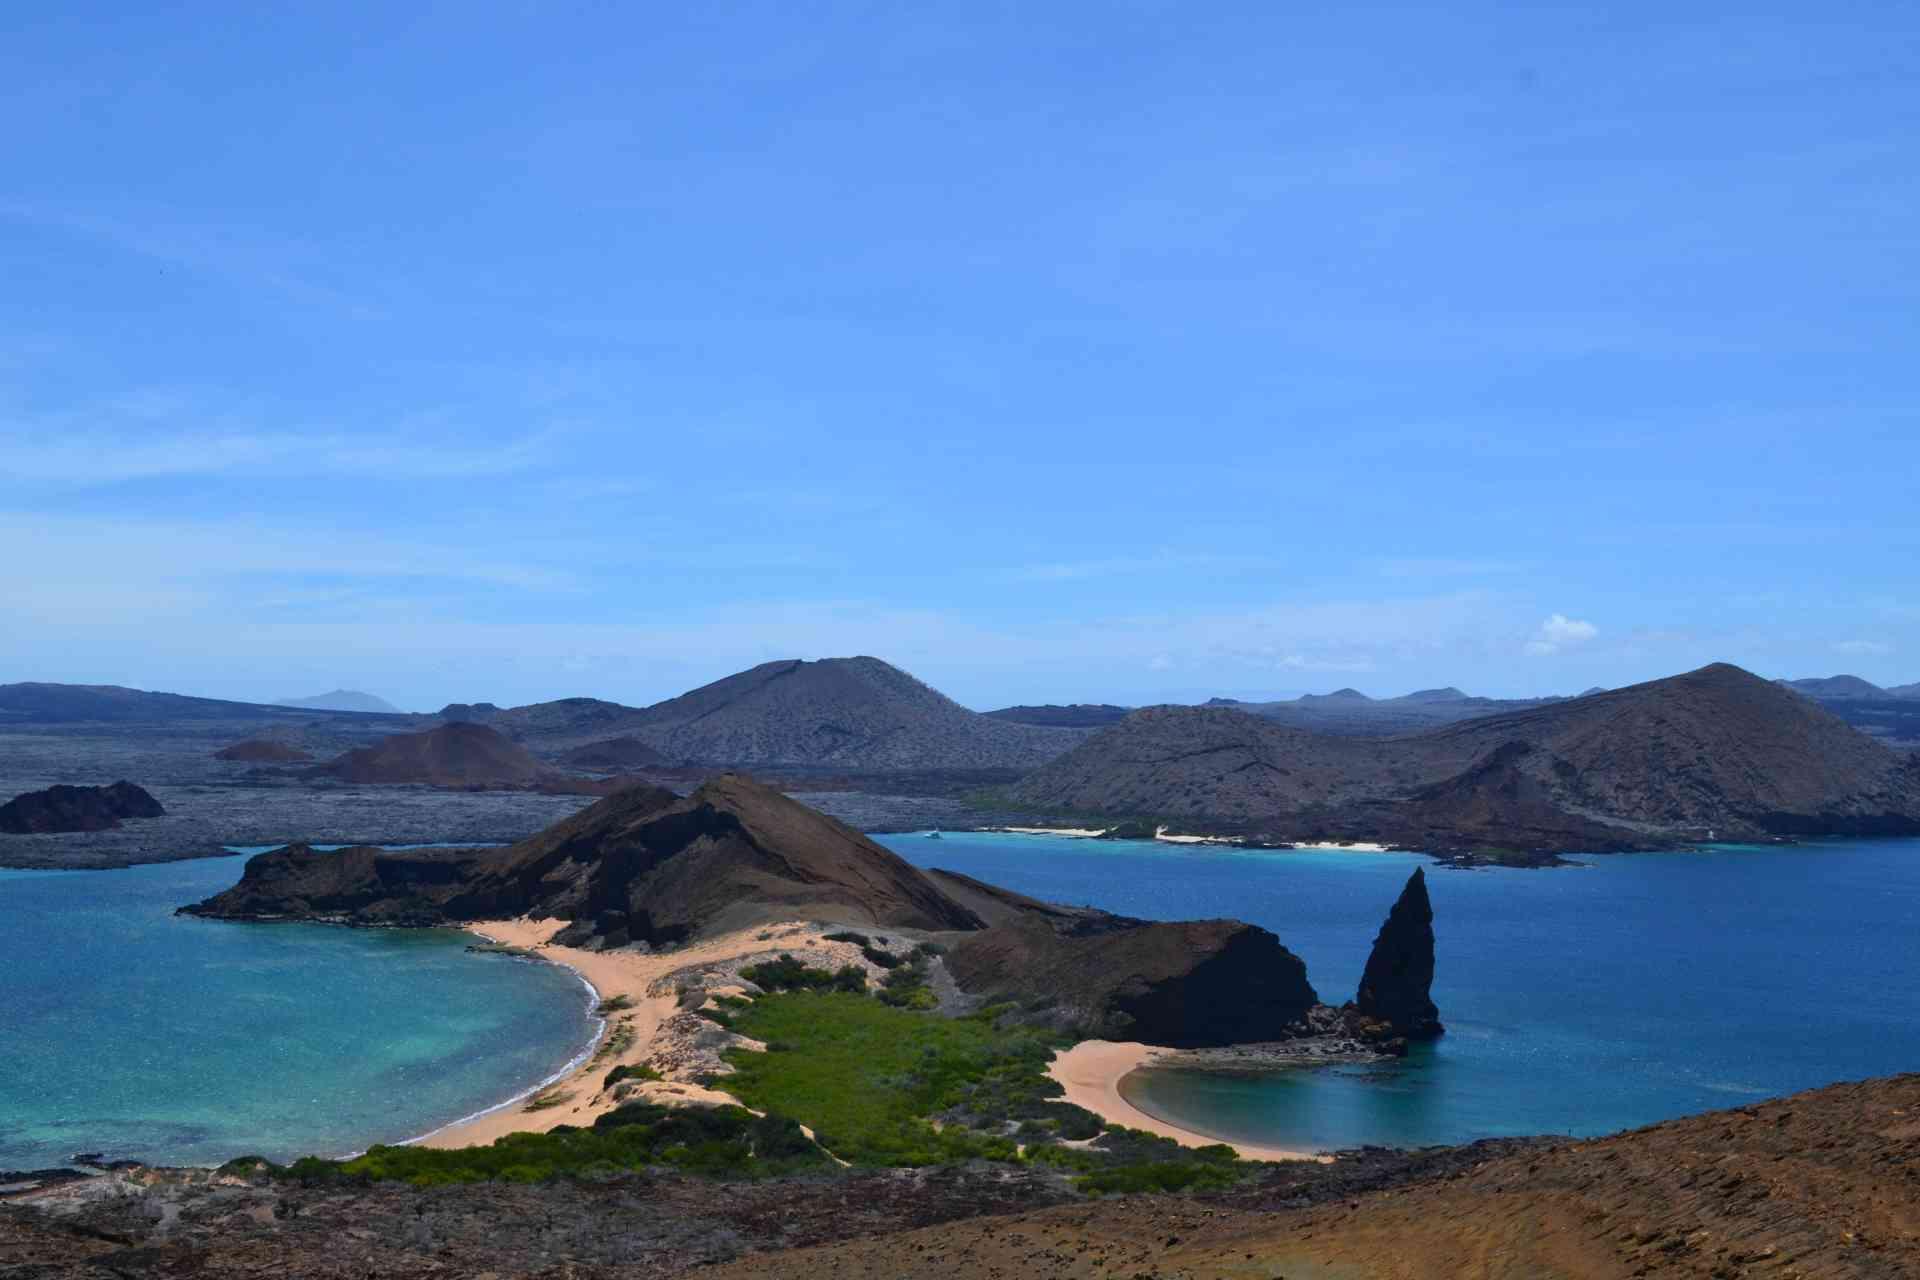 Galapagos Islands by Natalia Borojovich